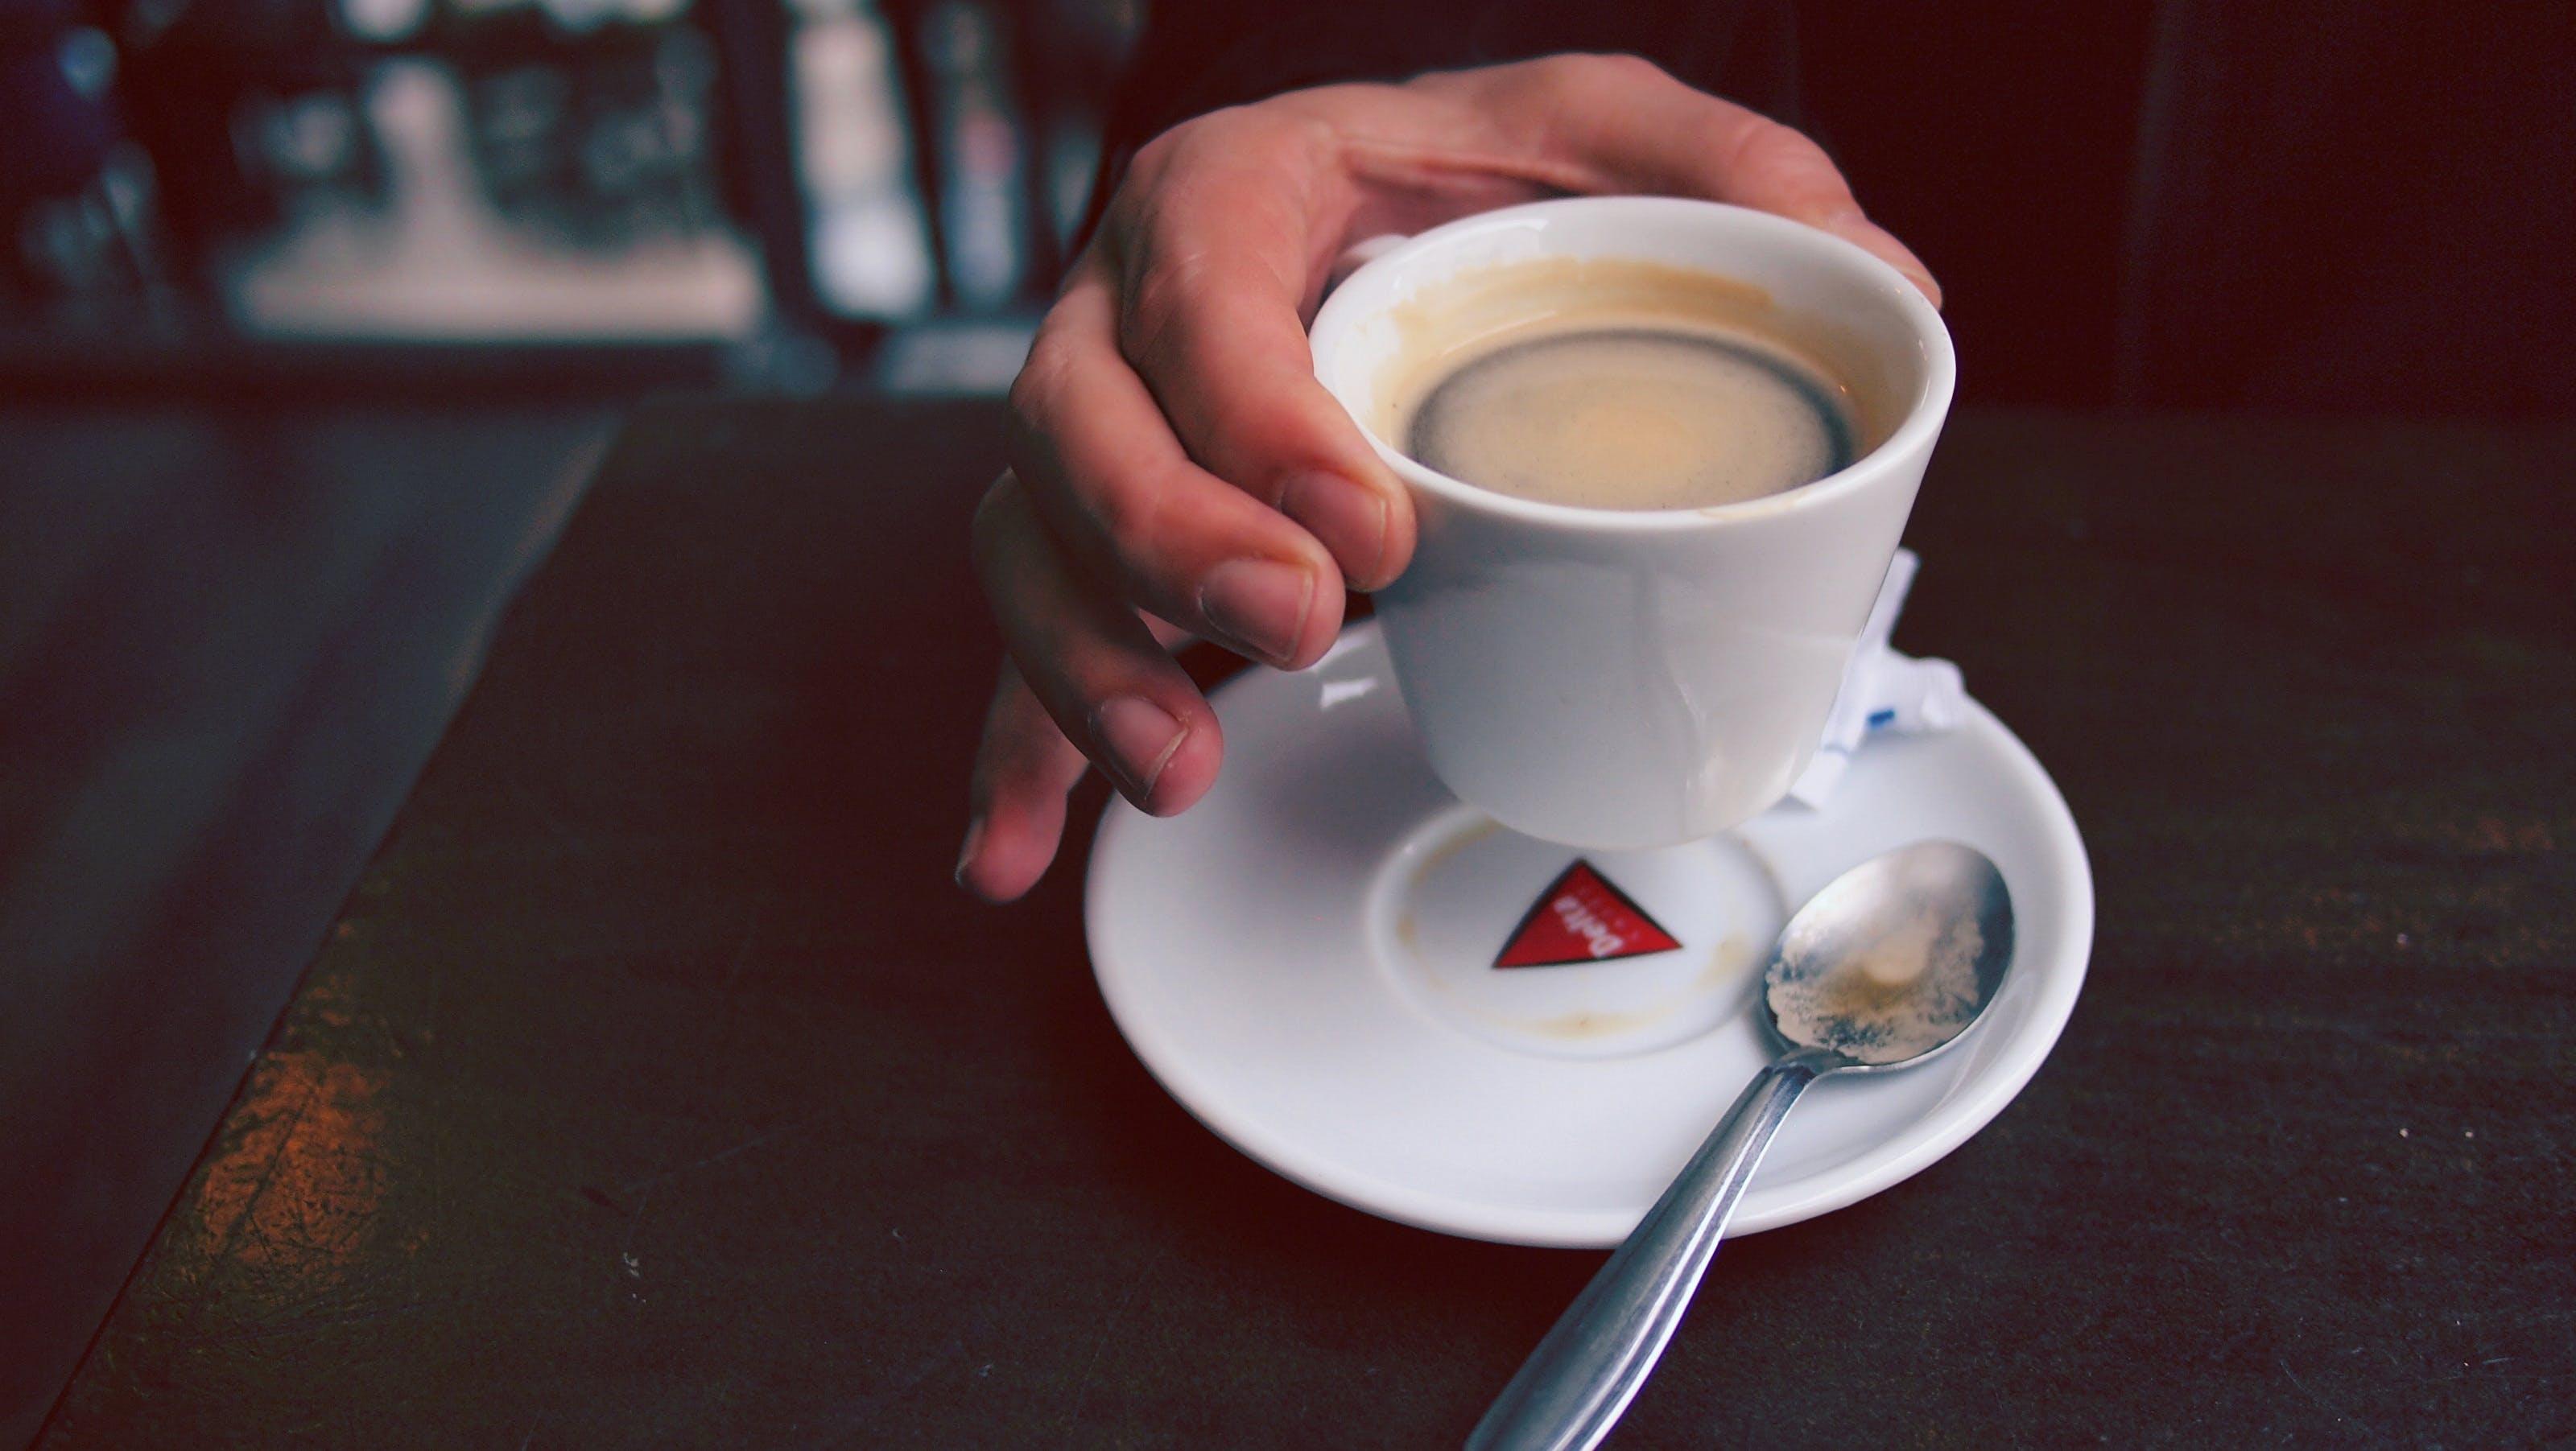 beverage, brewed, café